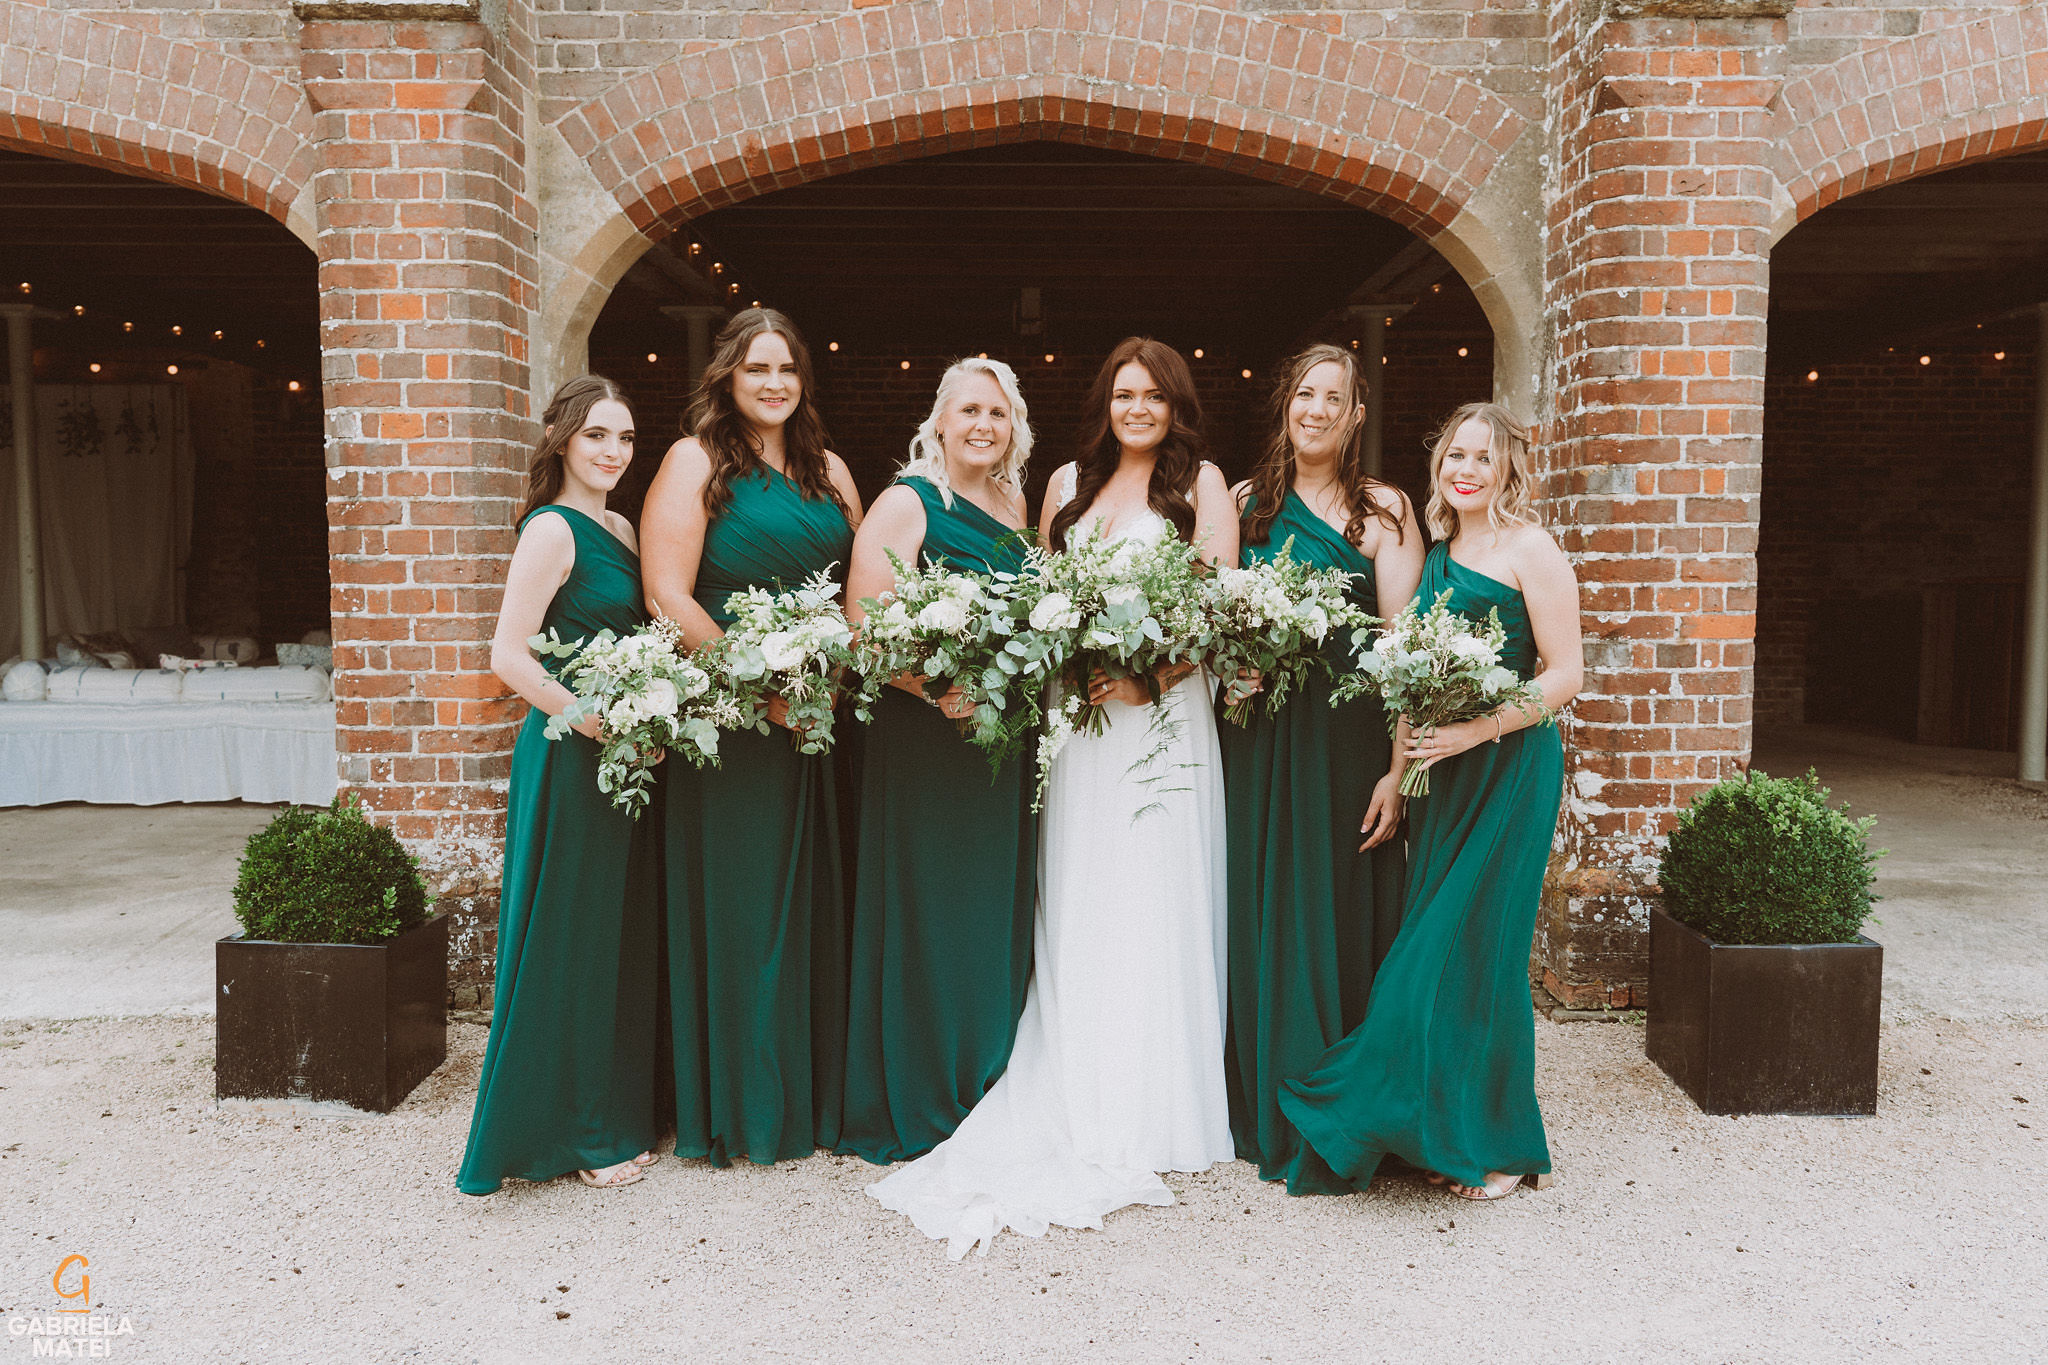 Bride and her bridesmaids at South Stoke Barn wedding venue in Arundel